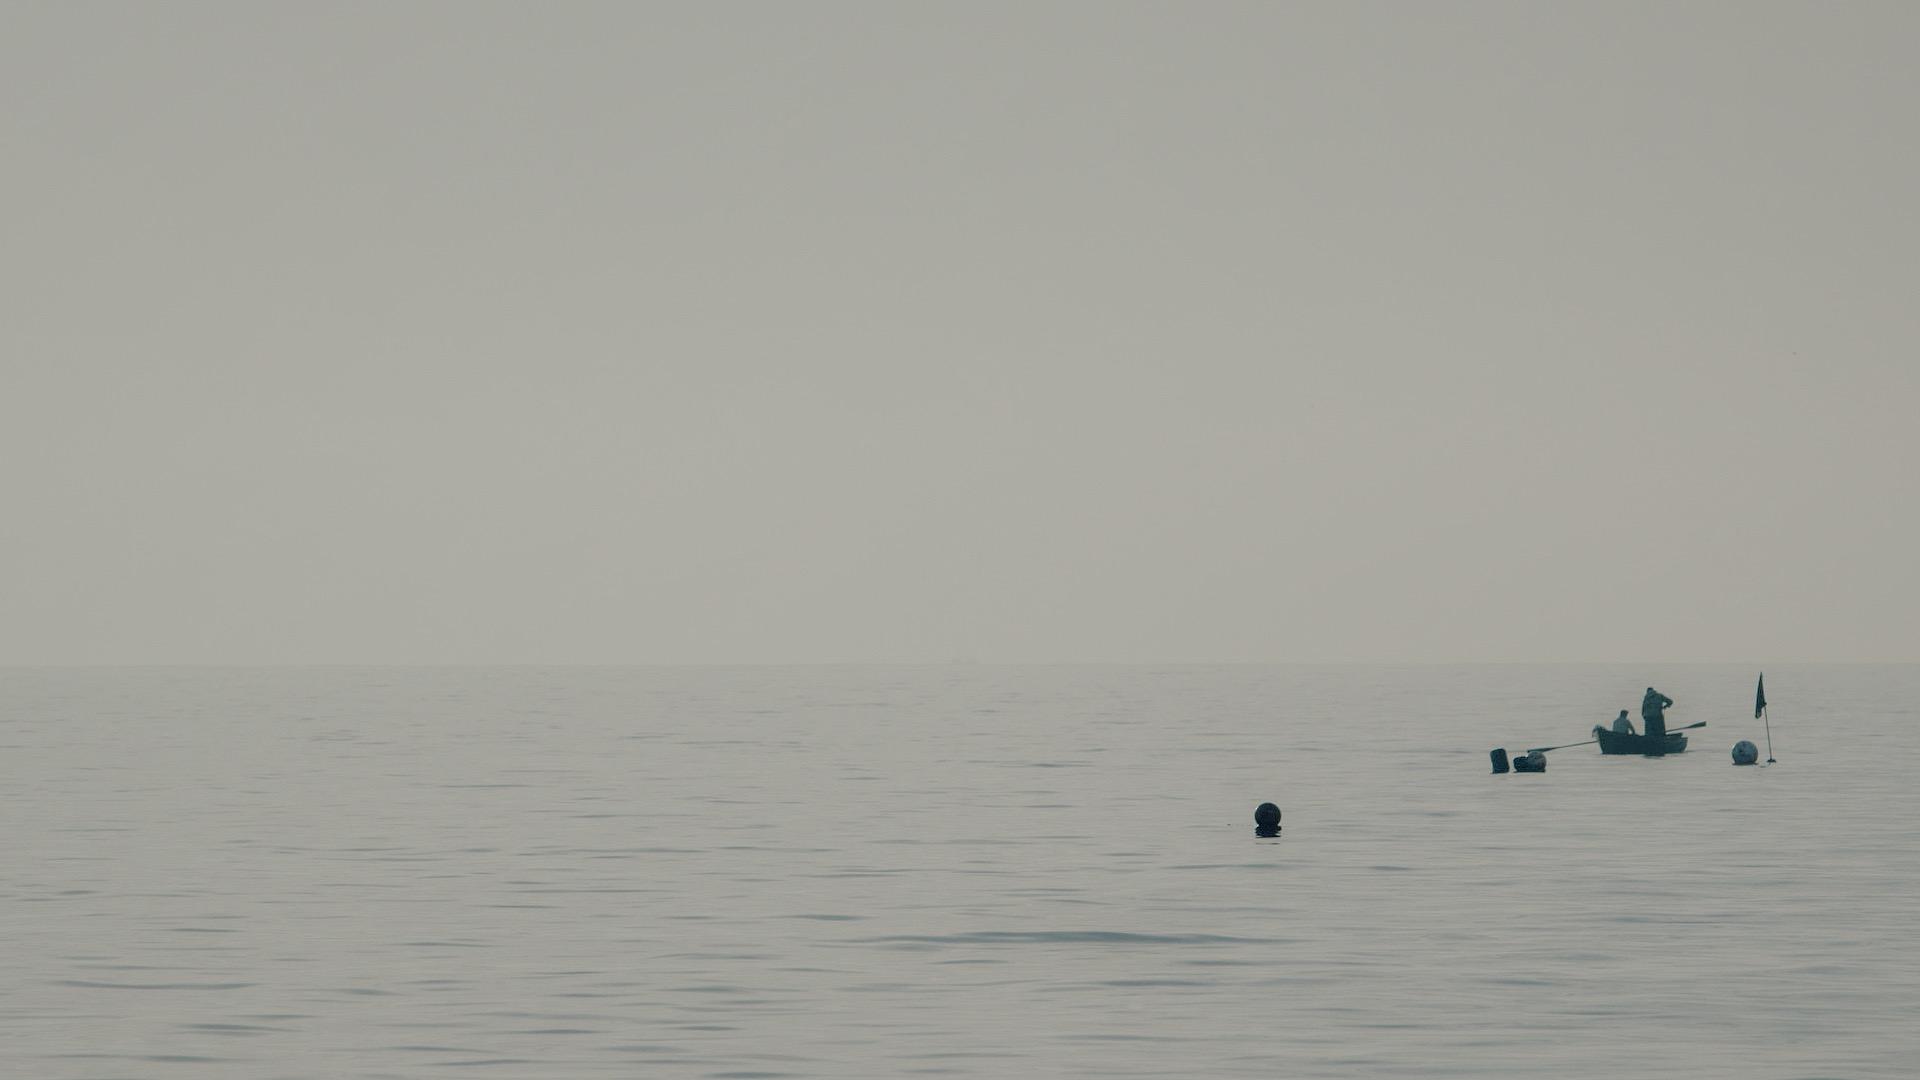 Fisherman_0060_Marker_516.jpg